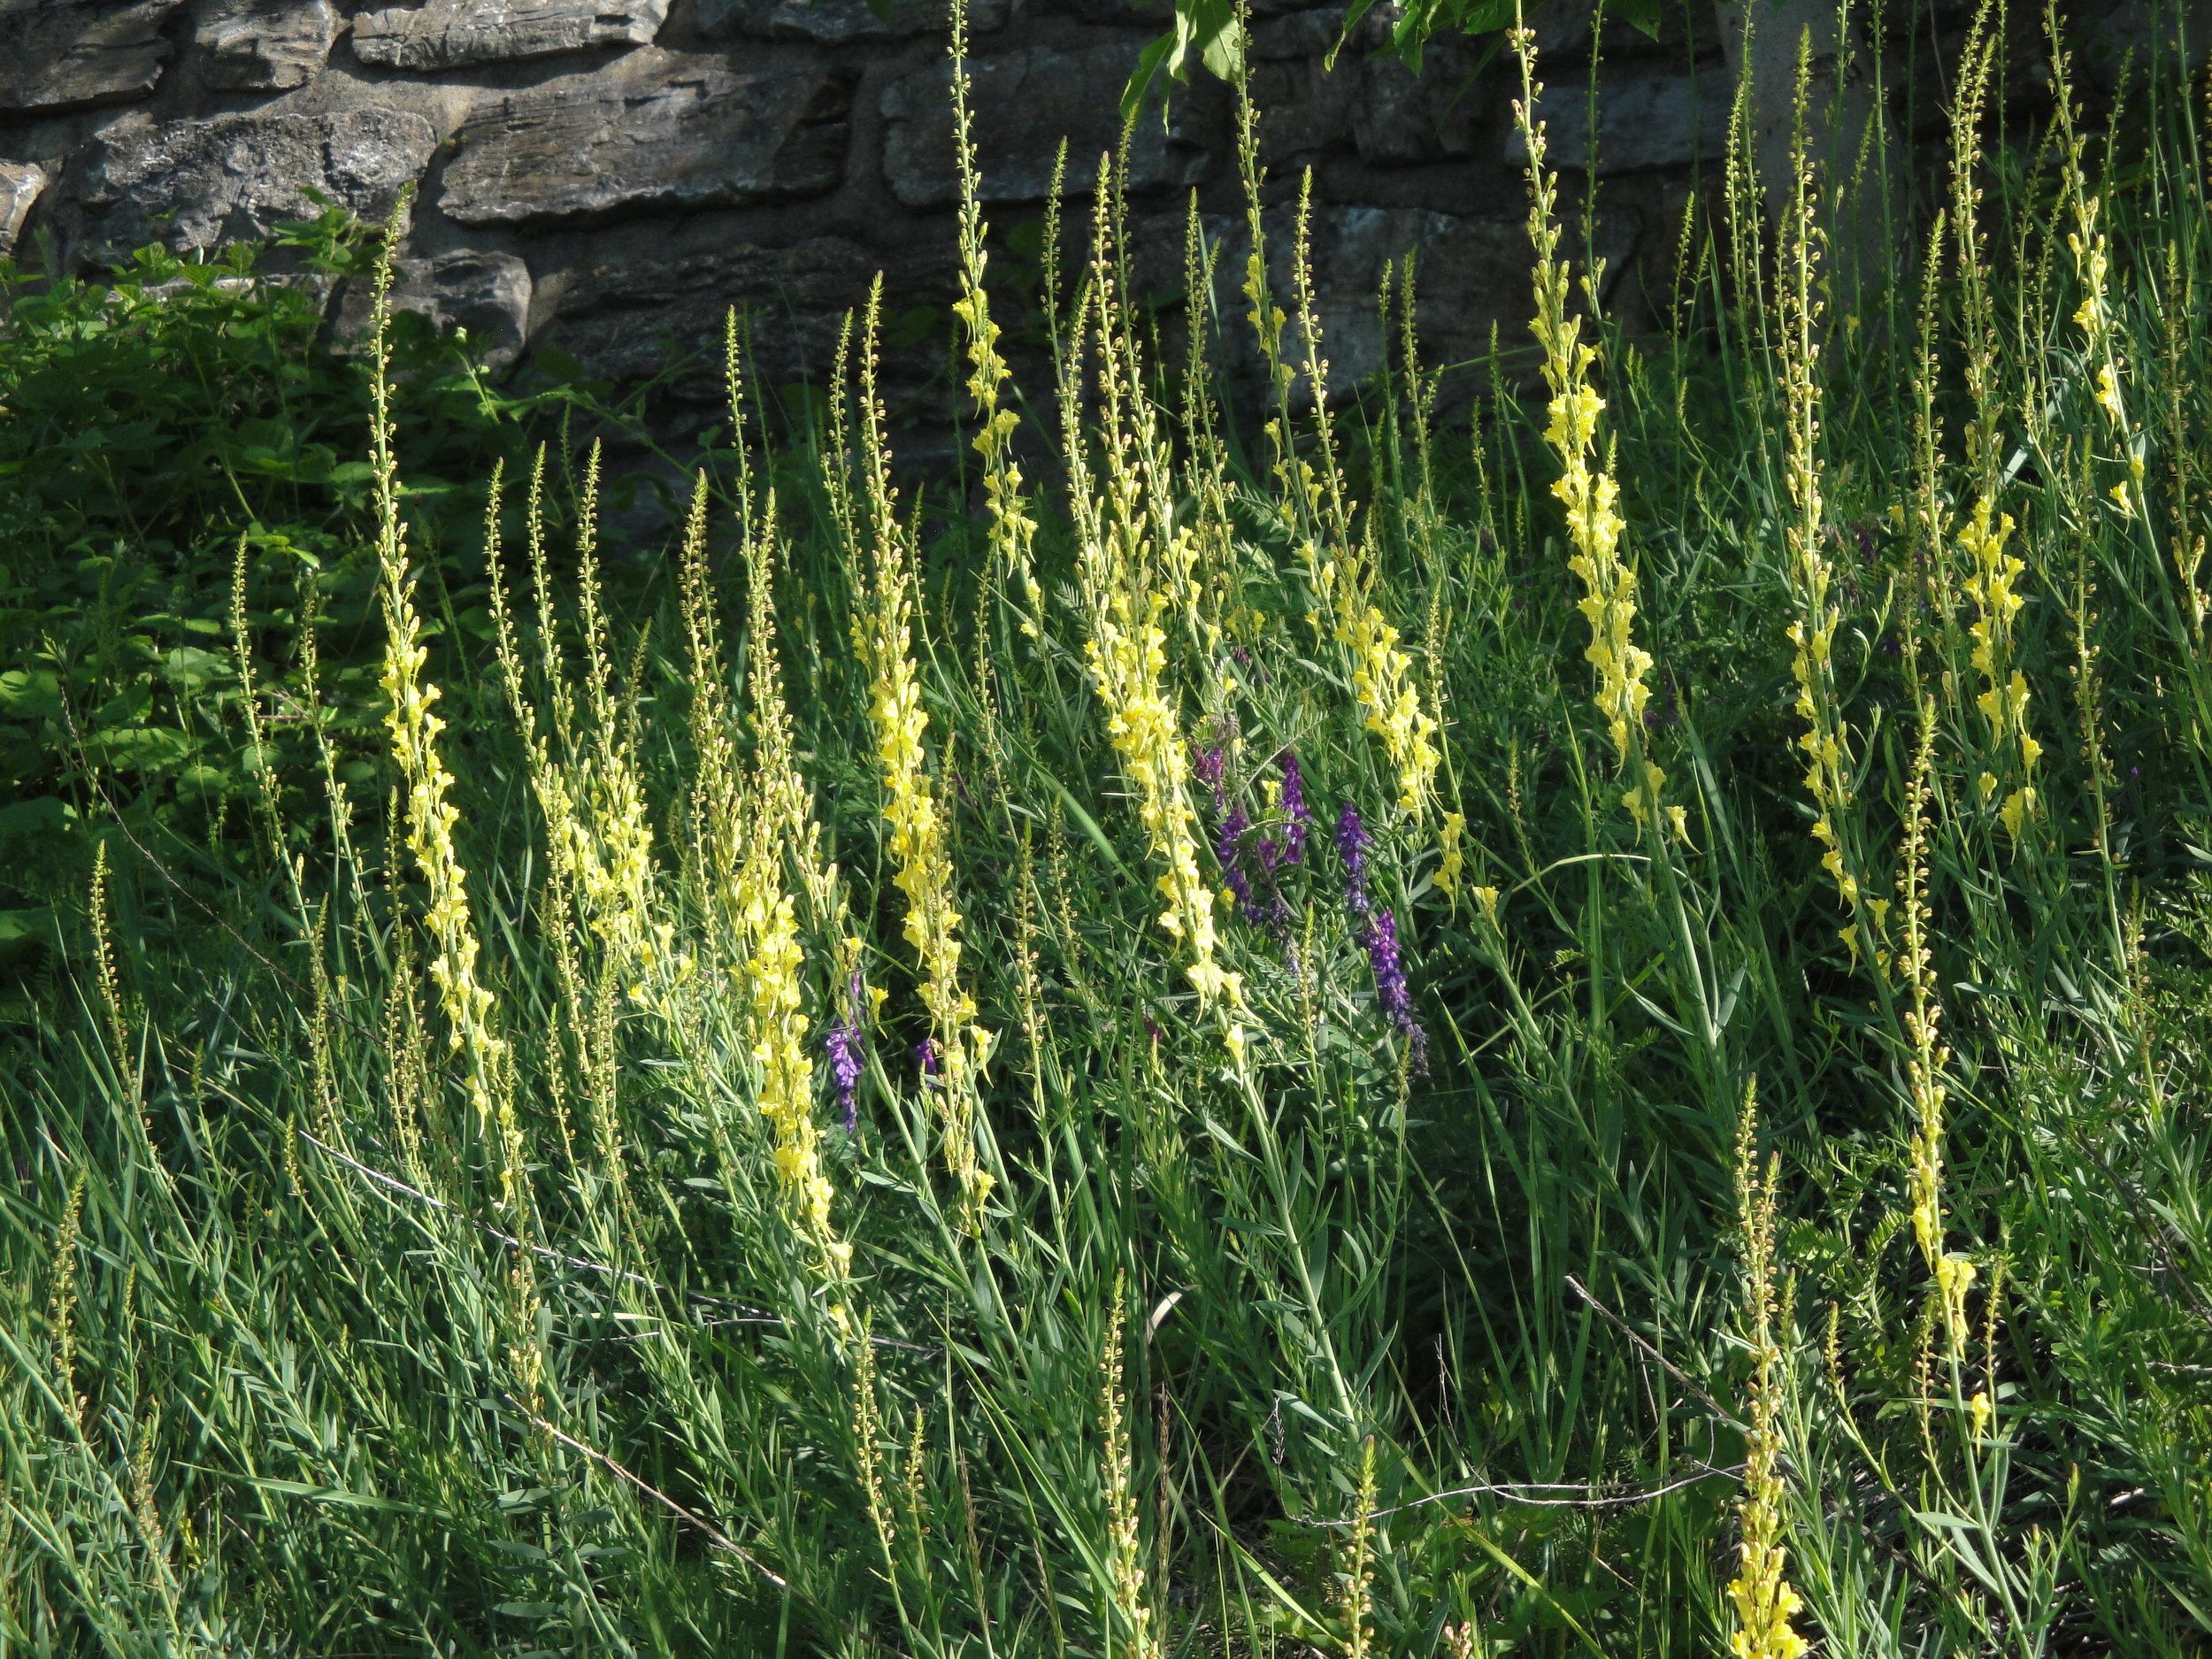 Salamandra_Blog_Wildpflanzen_05.JPG